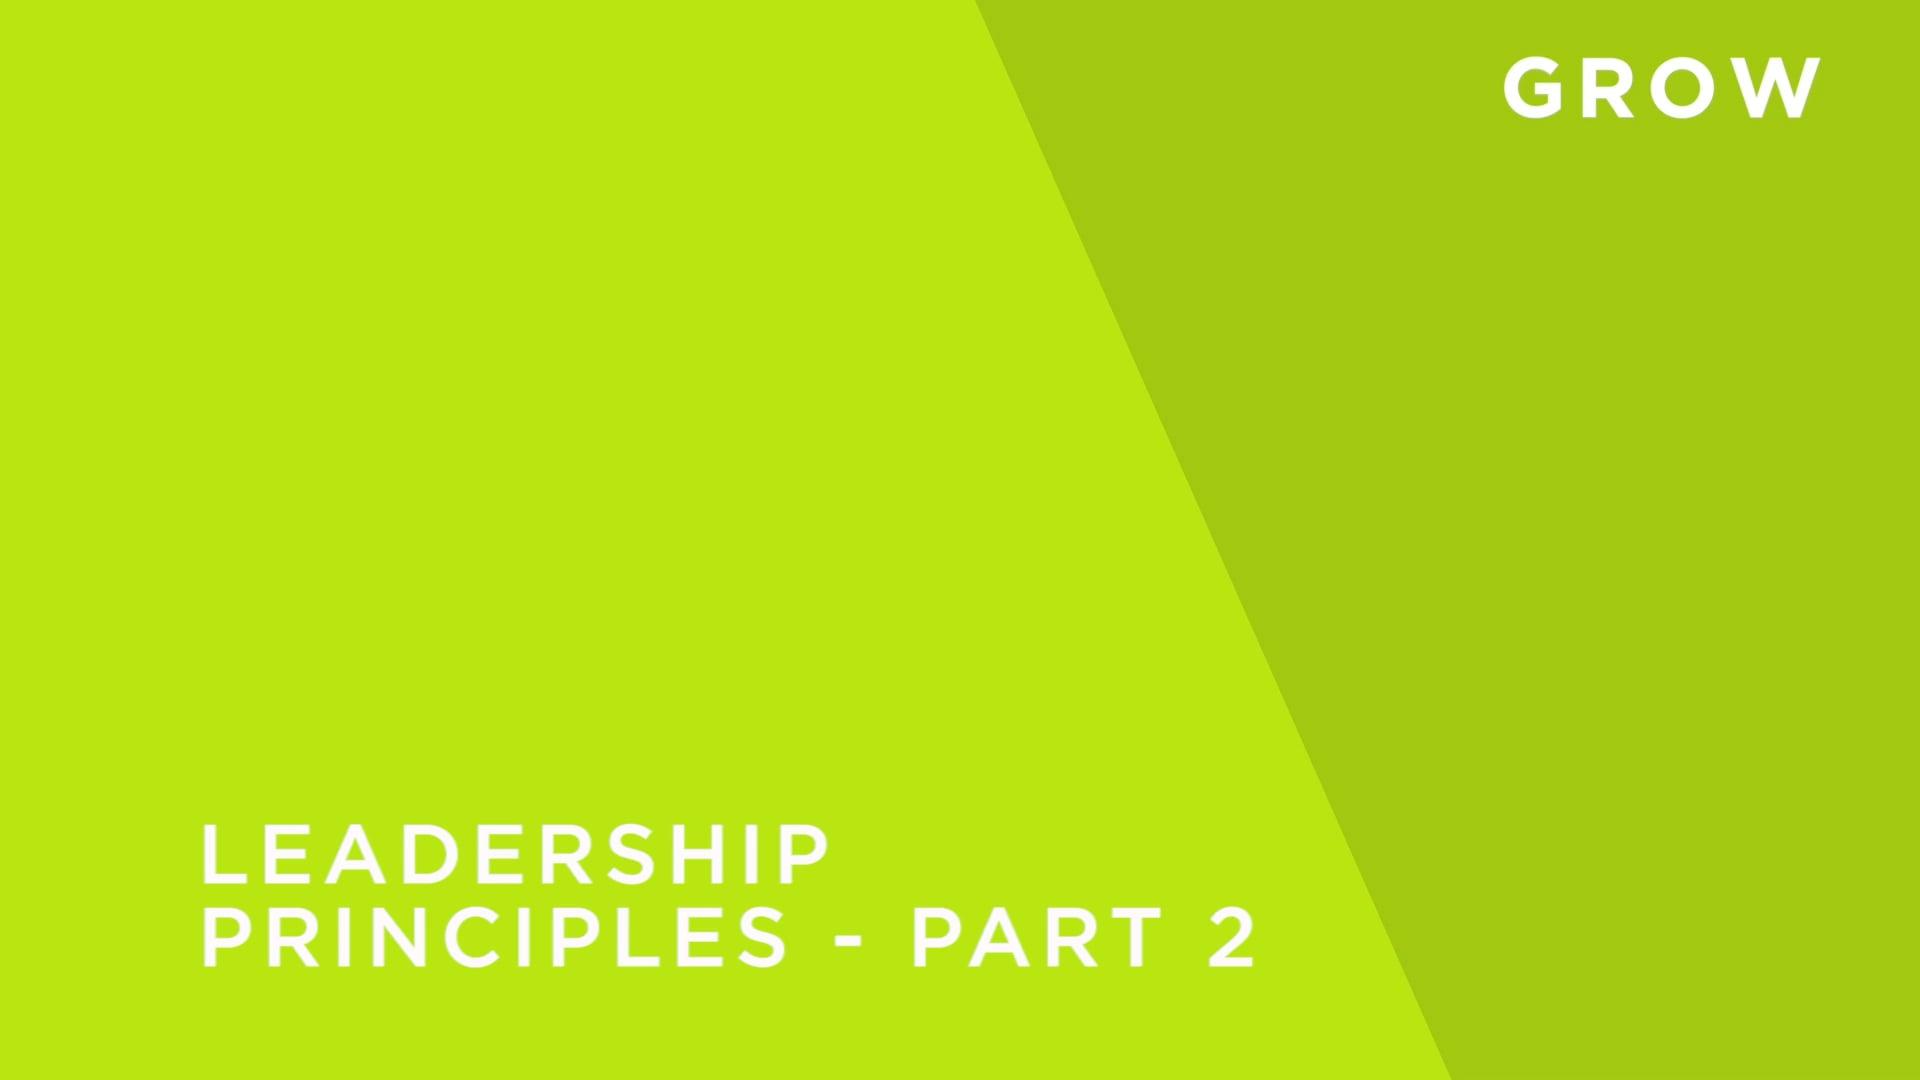 Leadership Principles - Part 2